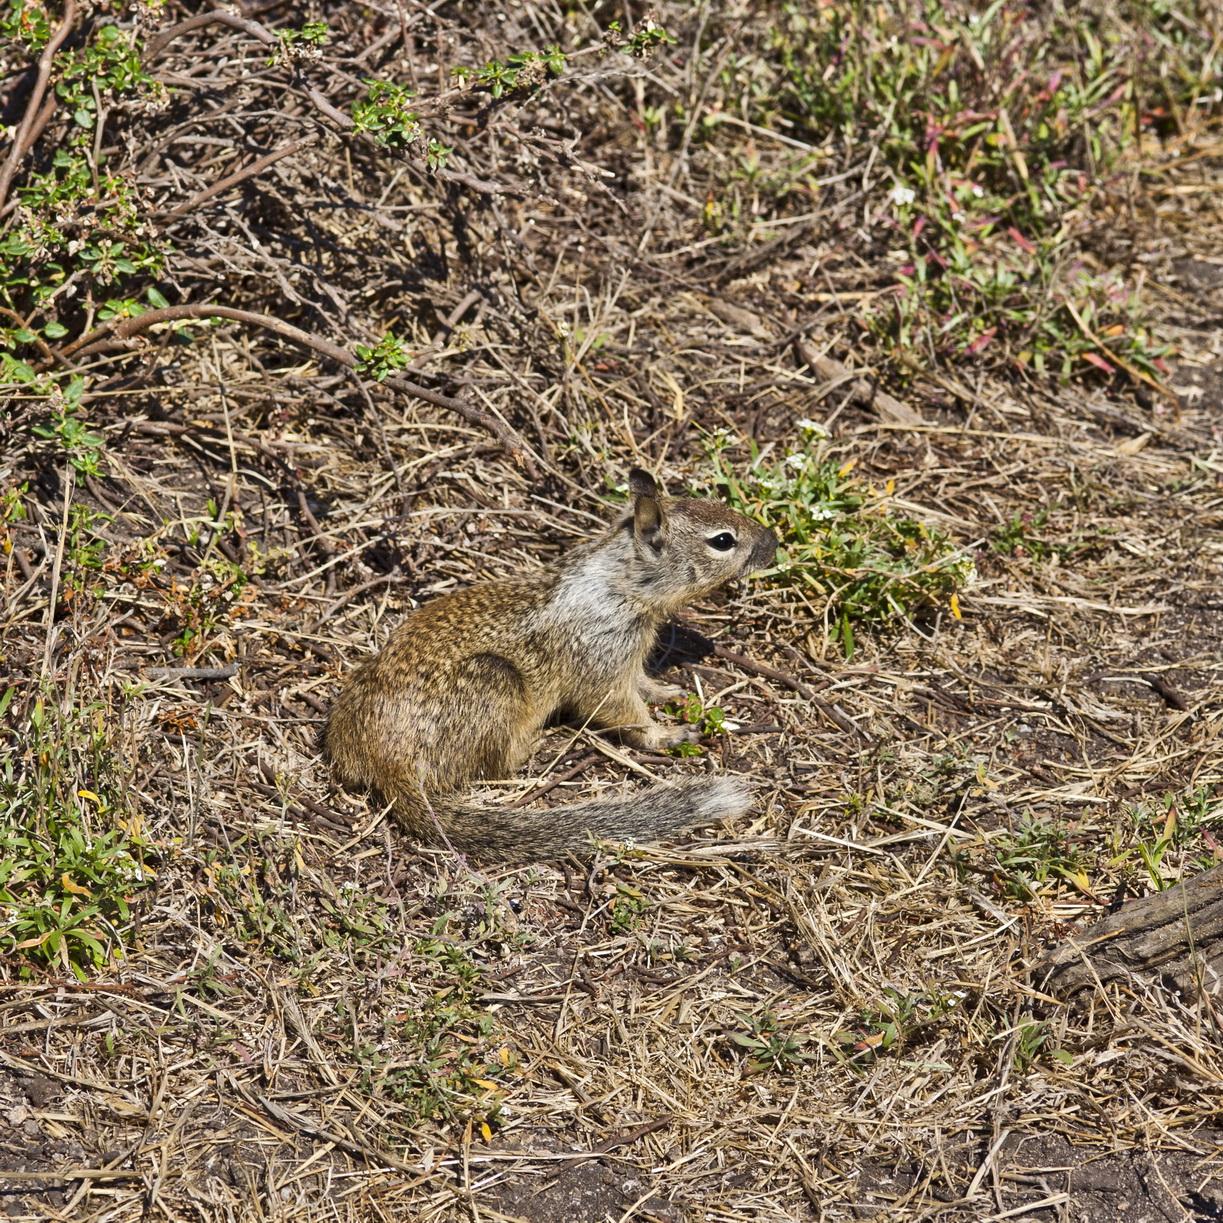 California ground squirrel Otospermophilus beecheyi 17 Mile Drive Monterey CA July 2011 12